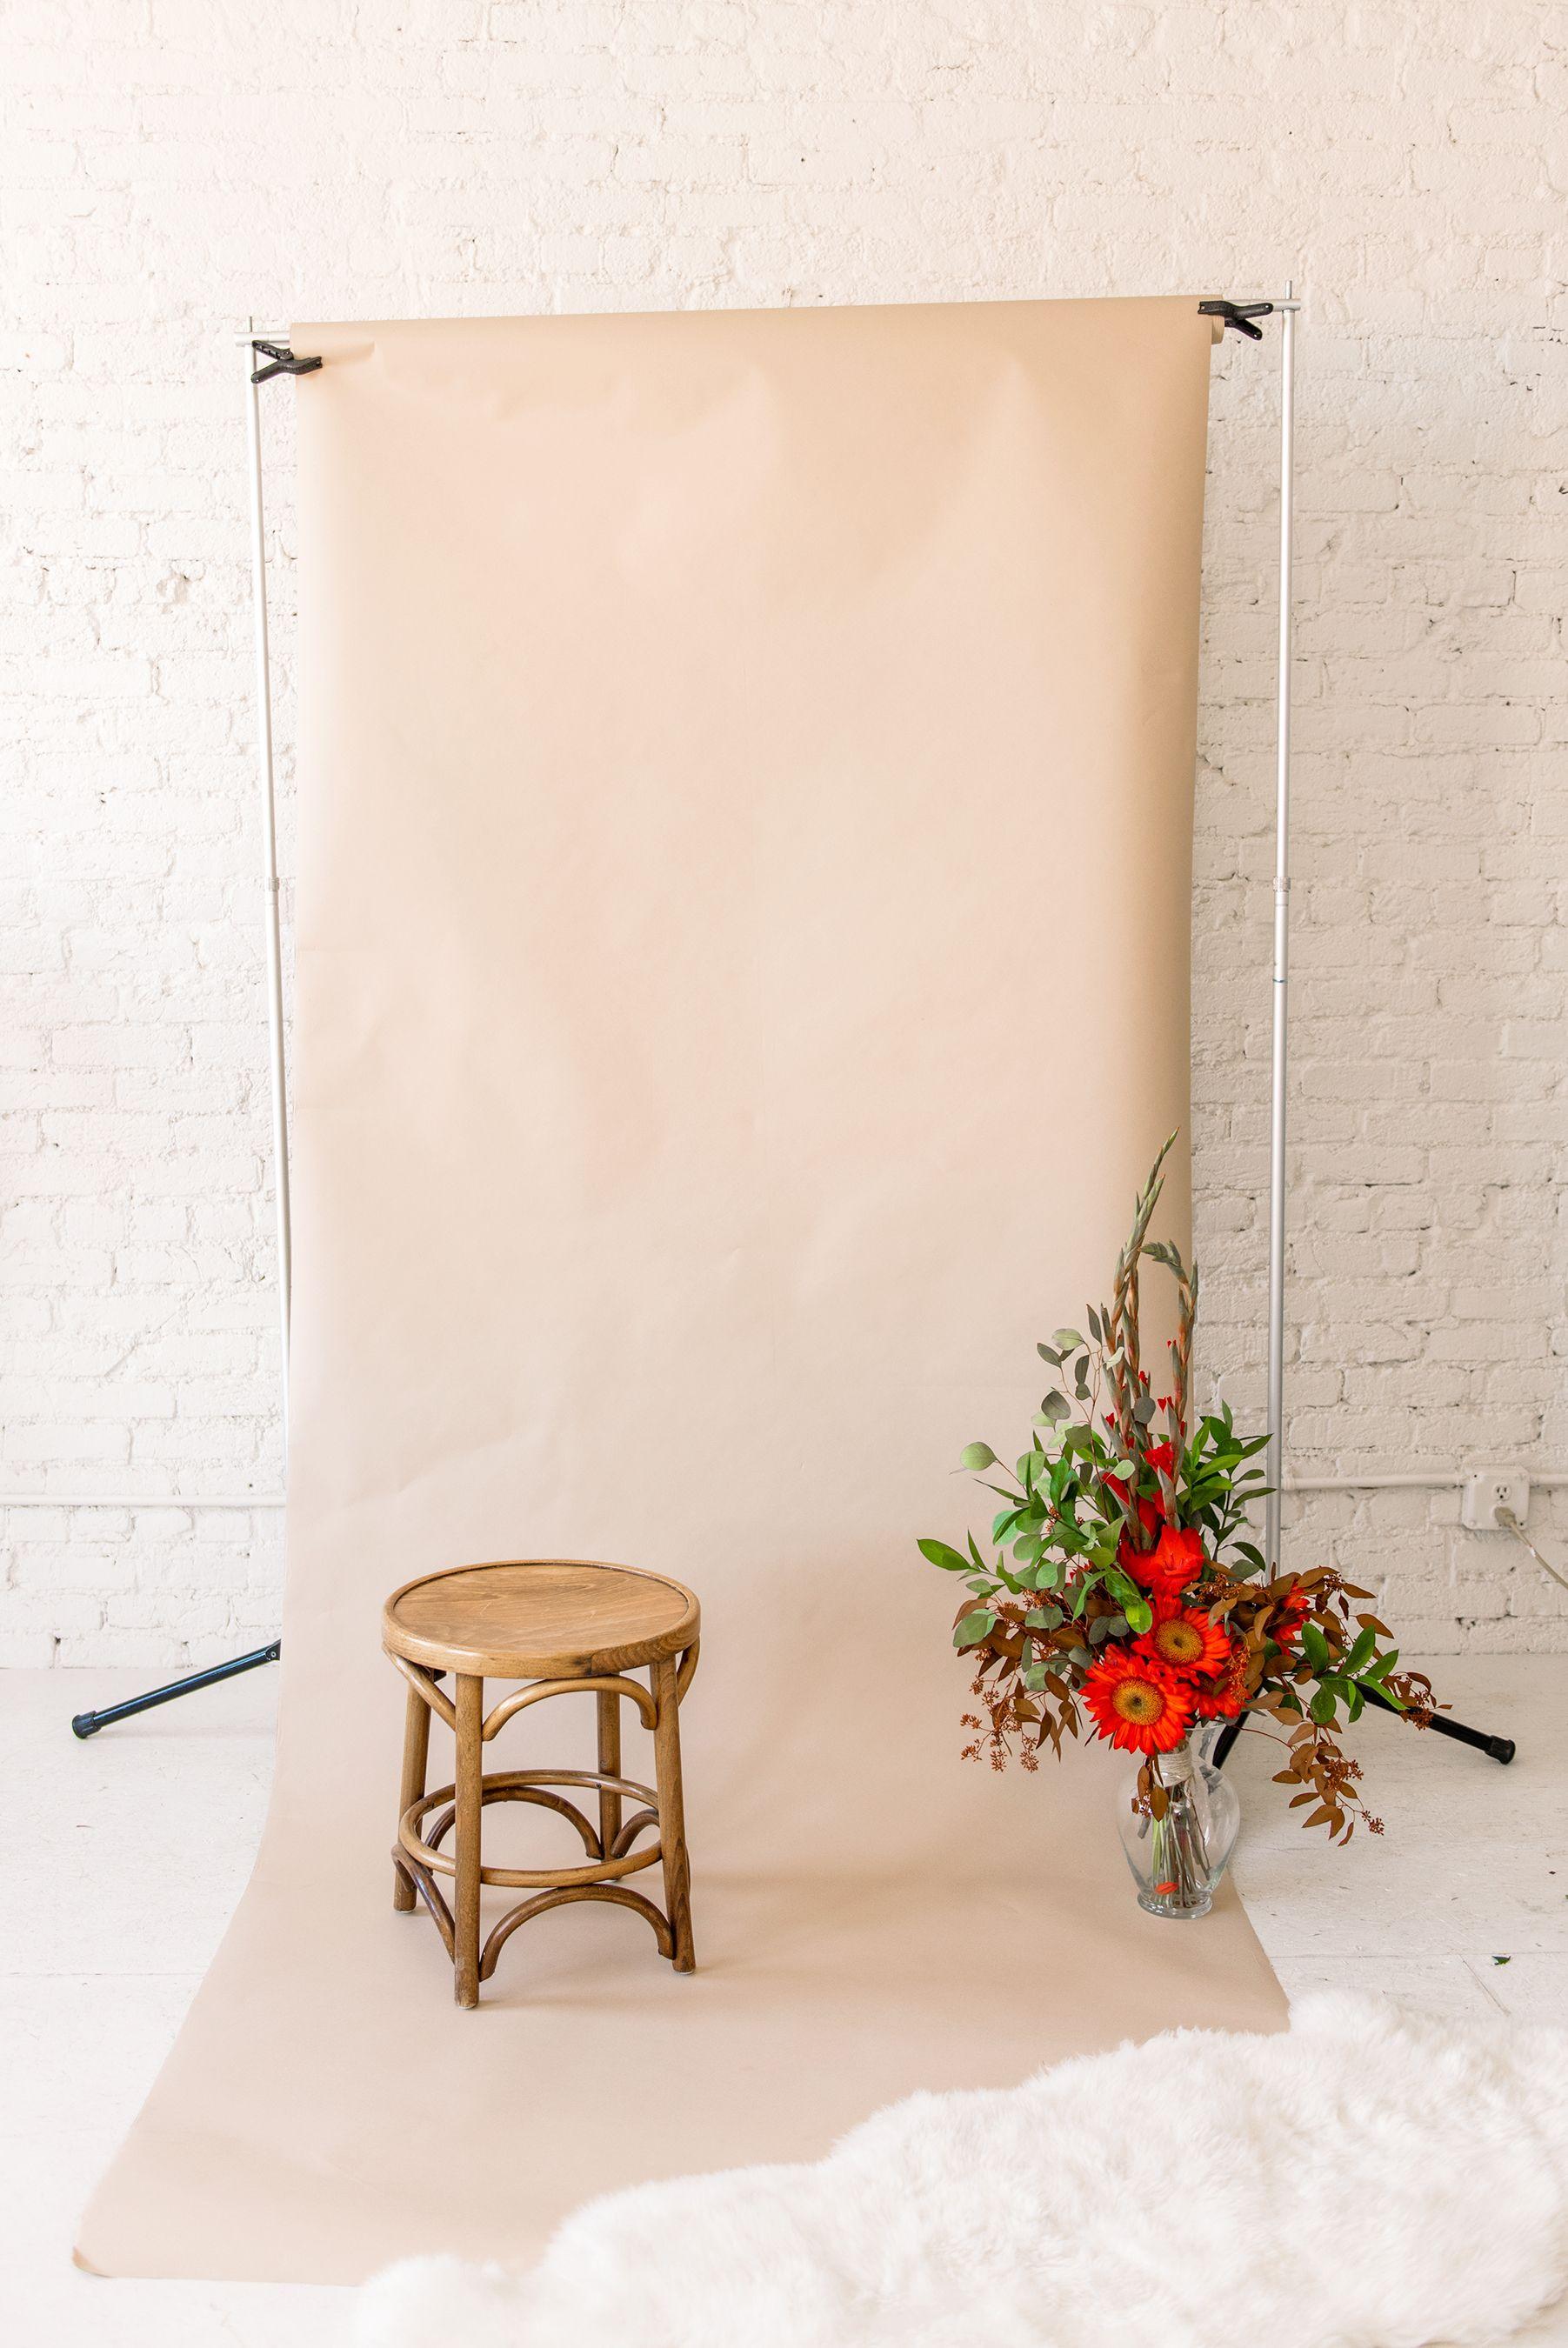 5 Studio Photoshoot Ideas - Karya Schanilec Photography